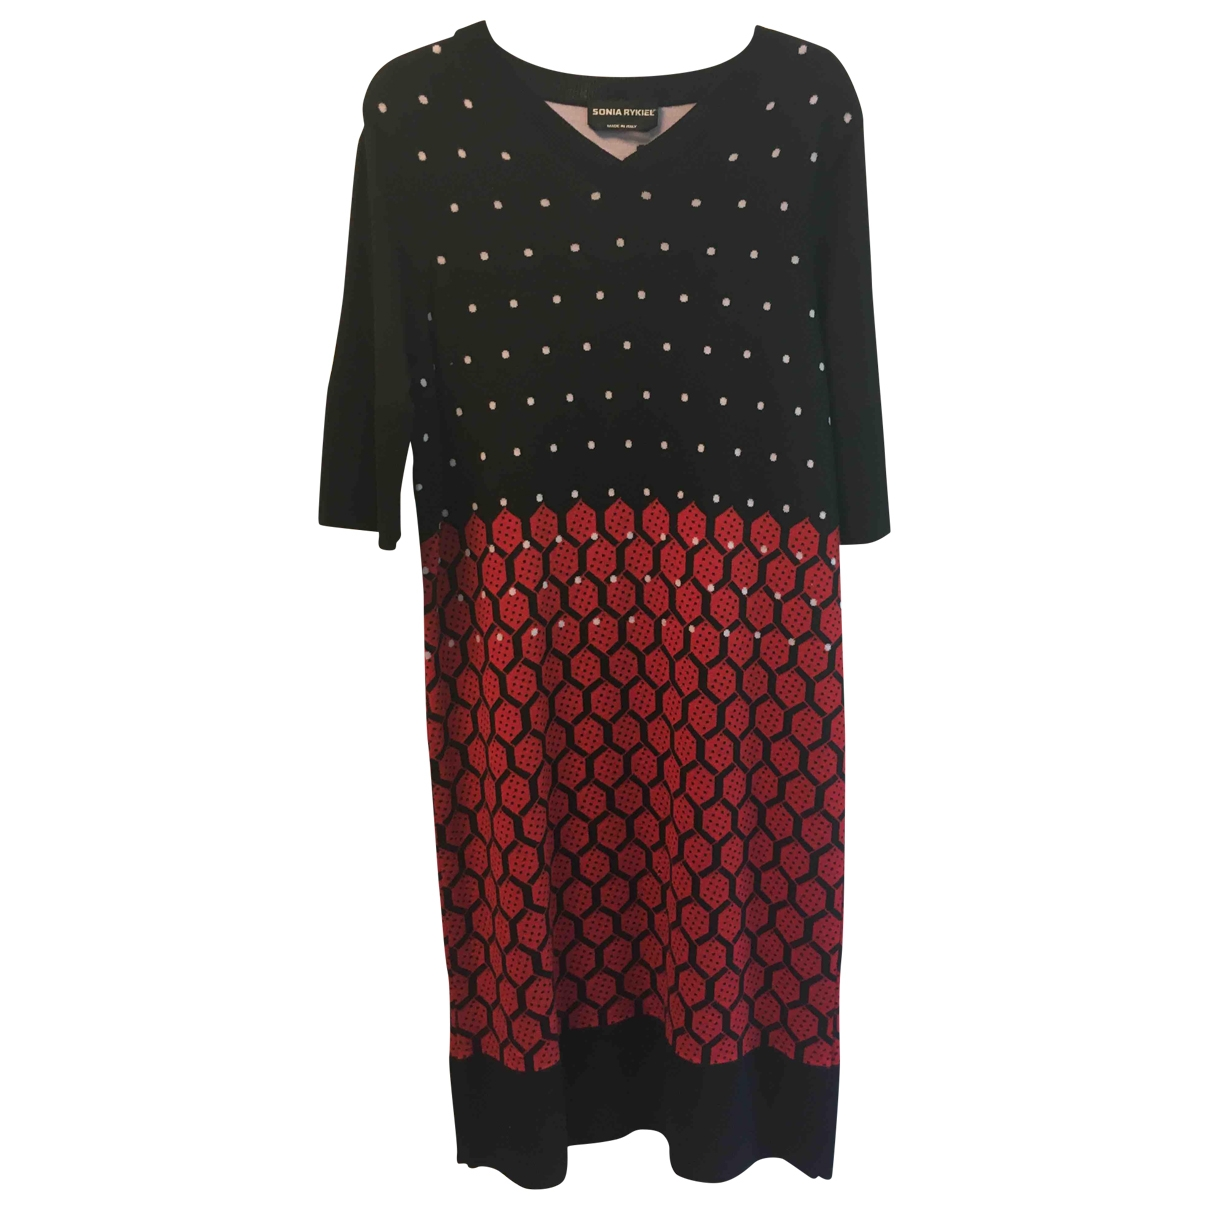 Sonia Rykiel \N Multicolour Wool dress for Women 36 FR